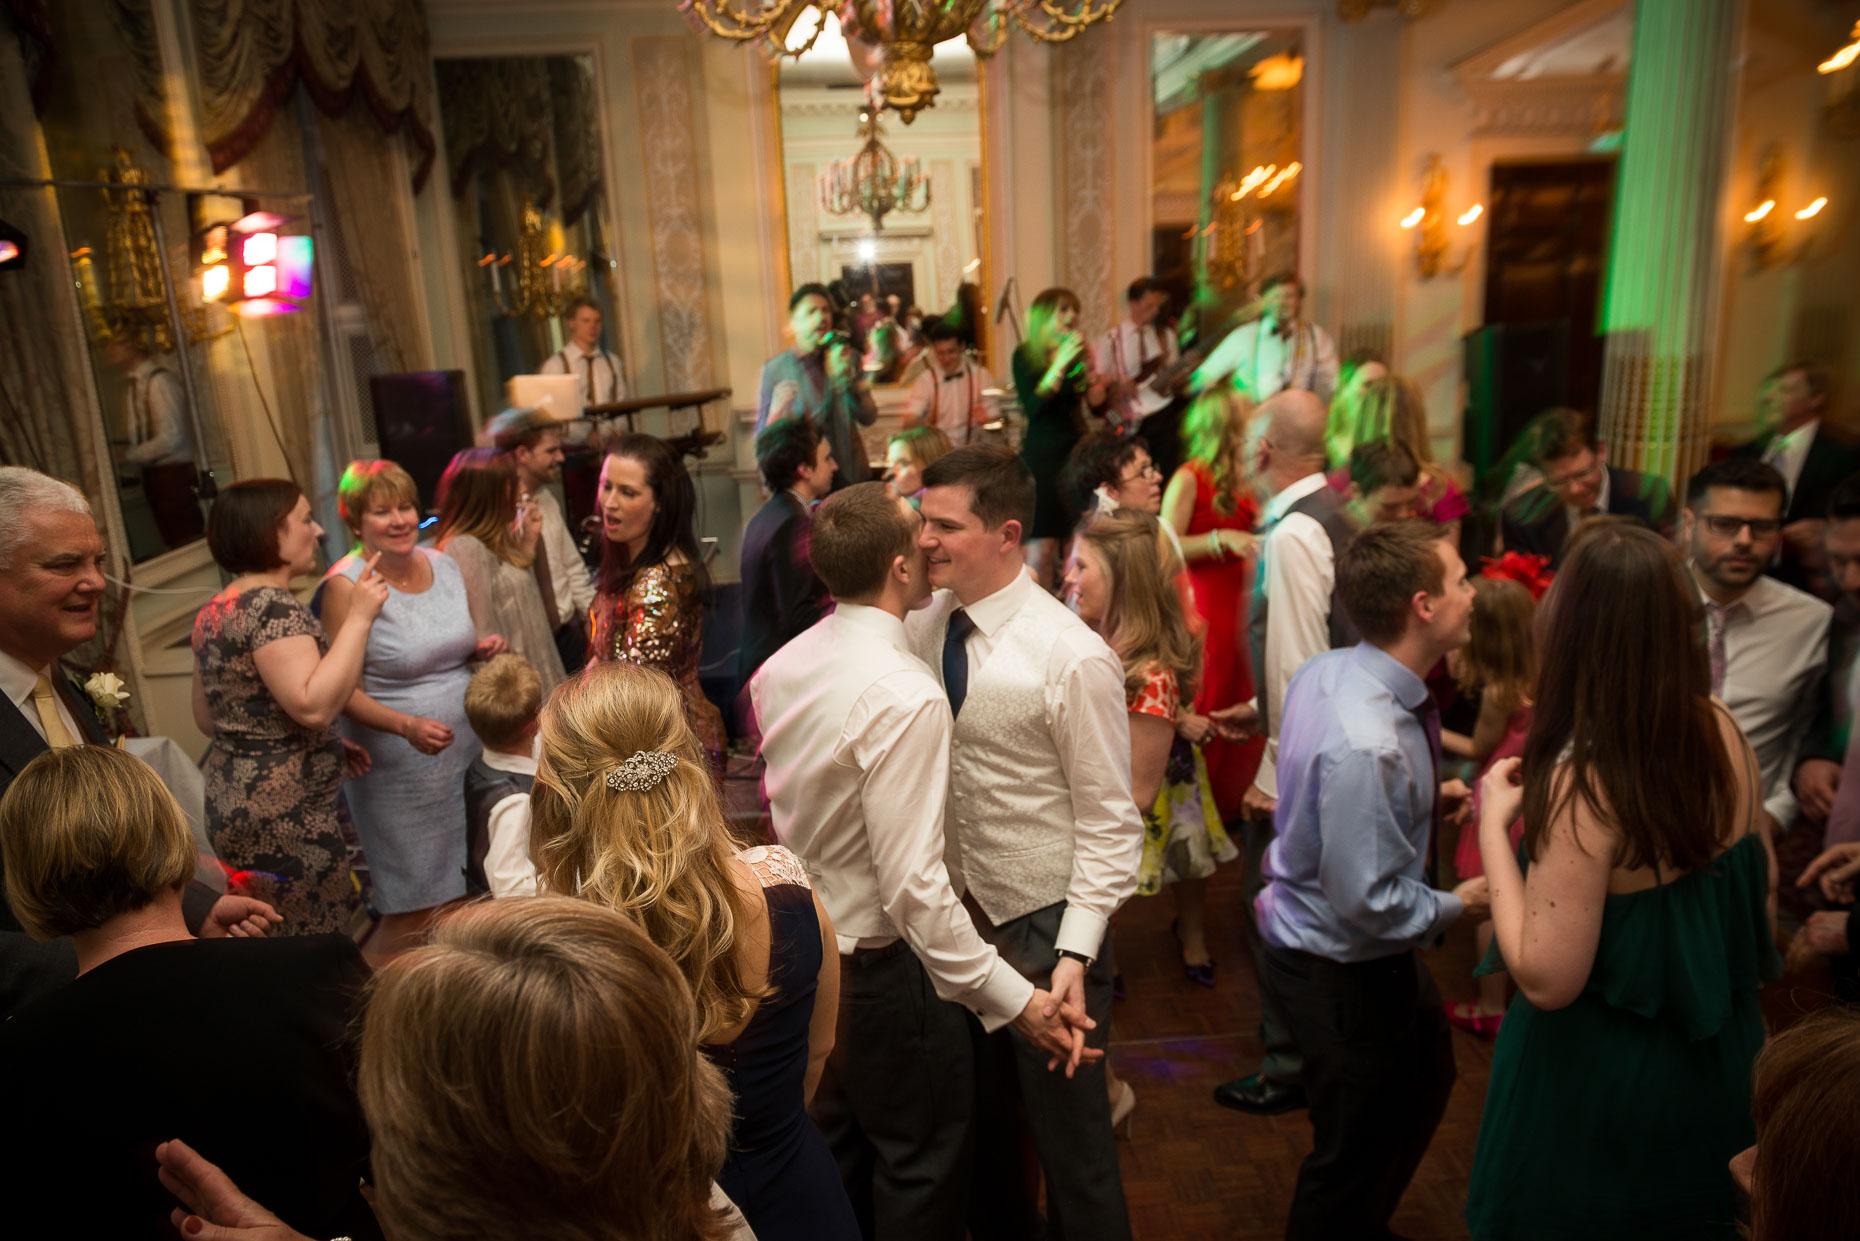 chris-matt-rac-club-dancefloor-london-gay-wedding-22.jpg